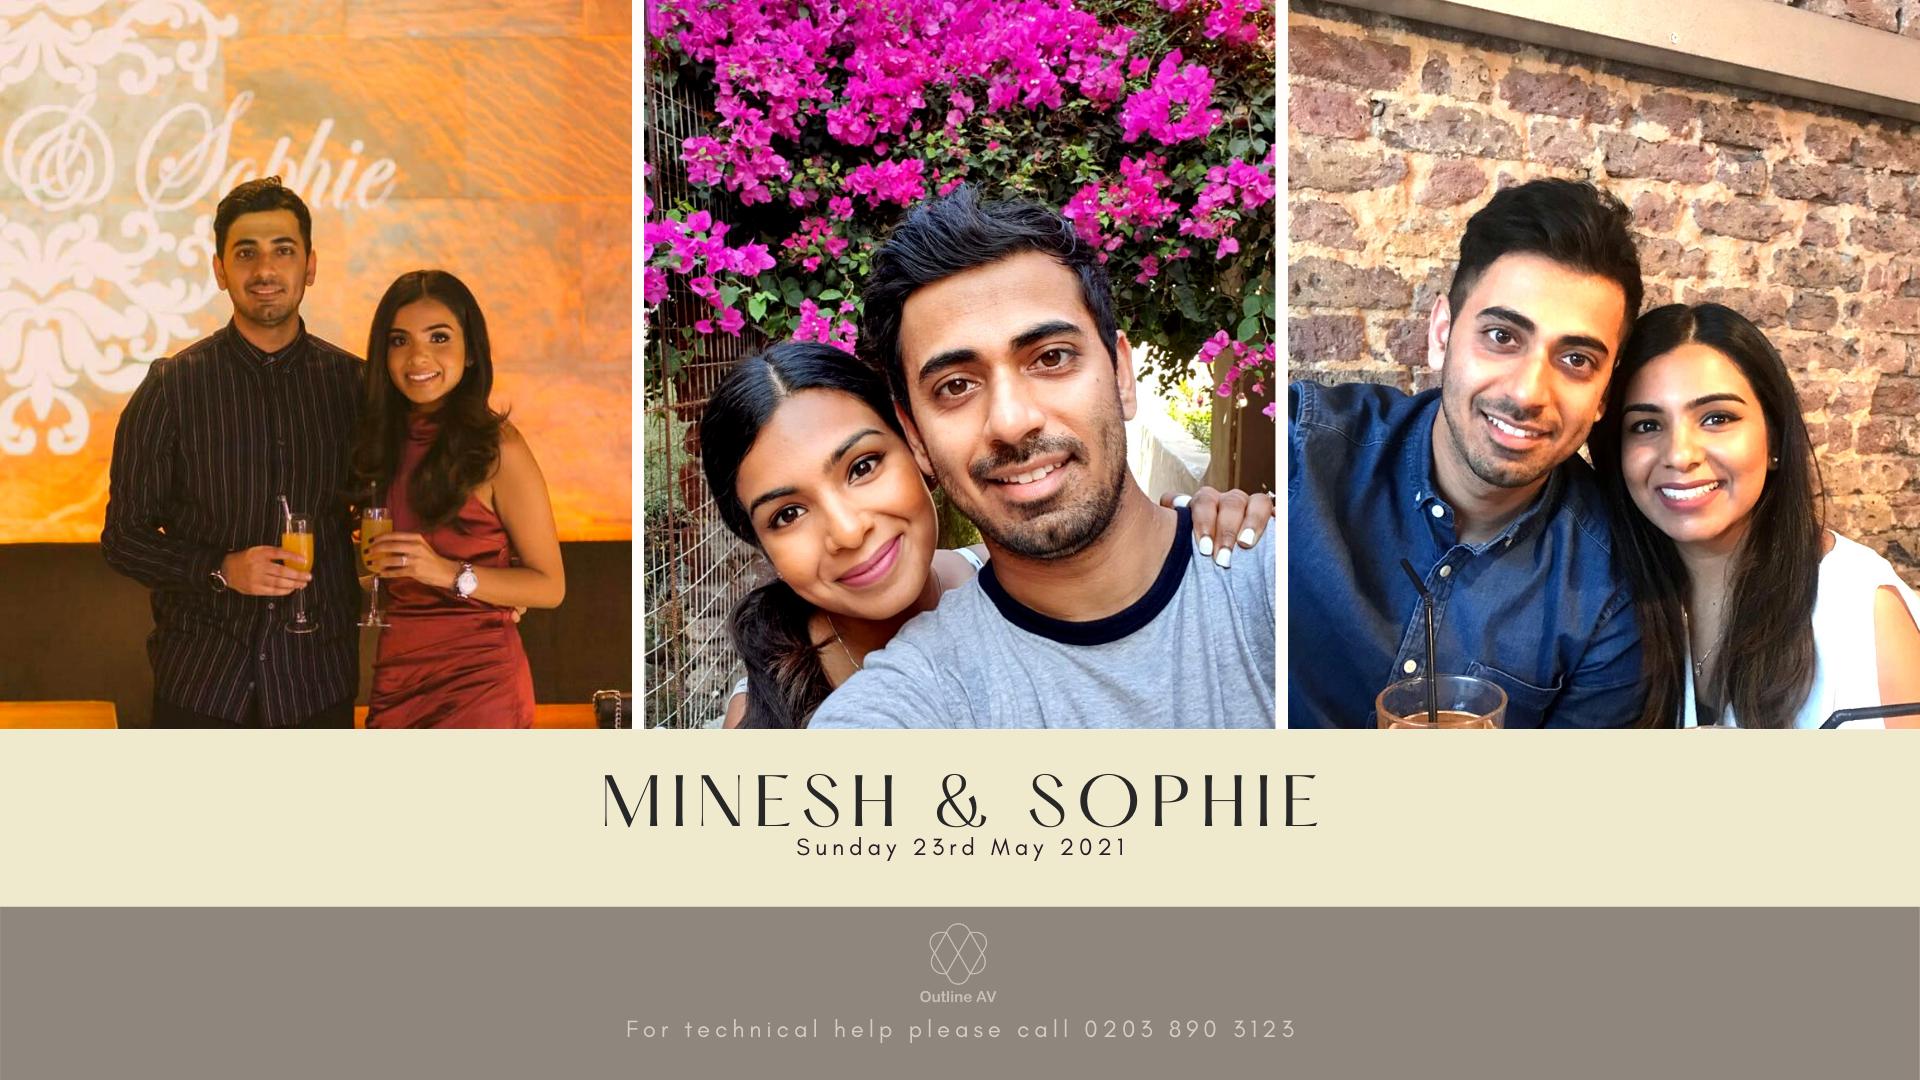 Minesh & Sophie - Live Stream